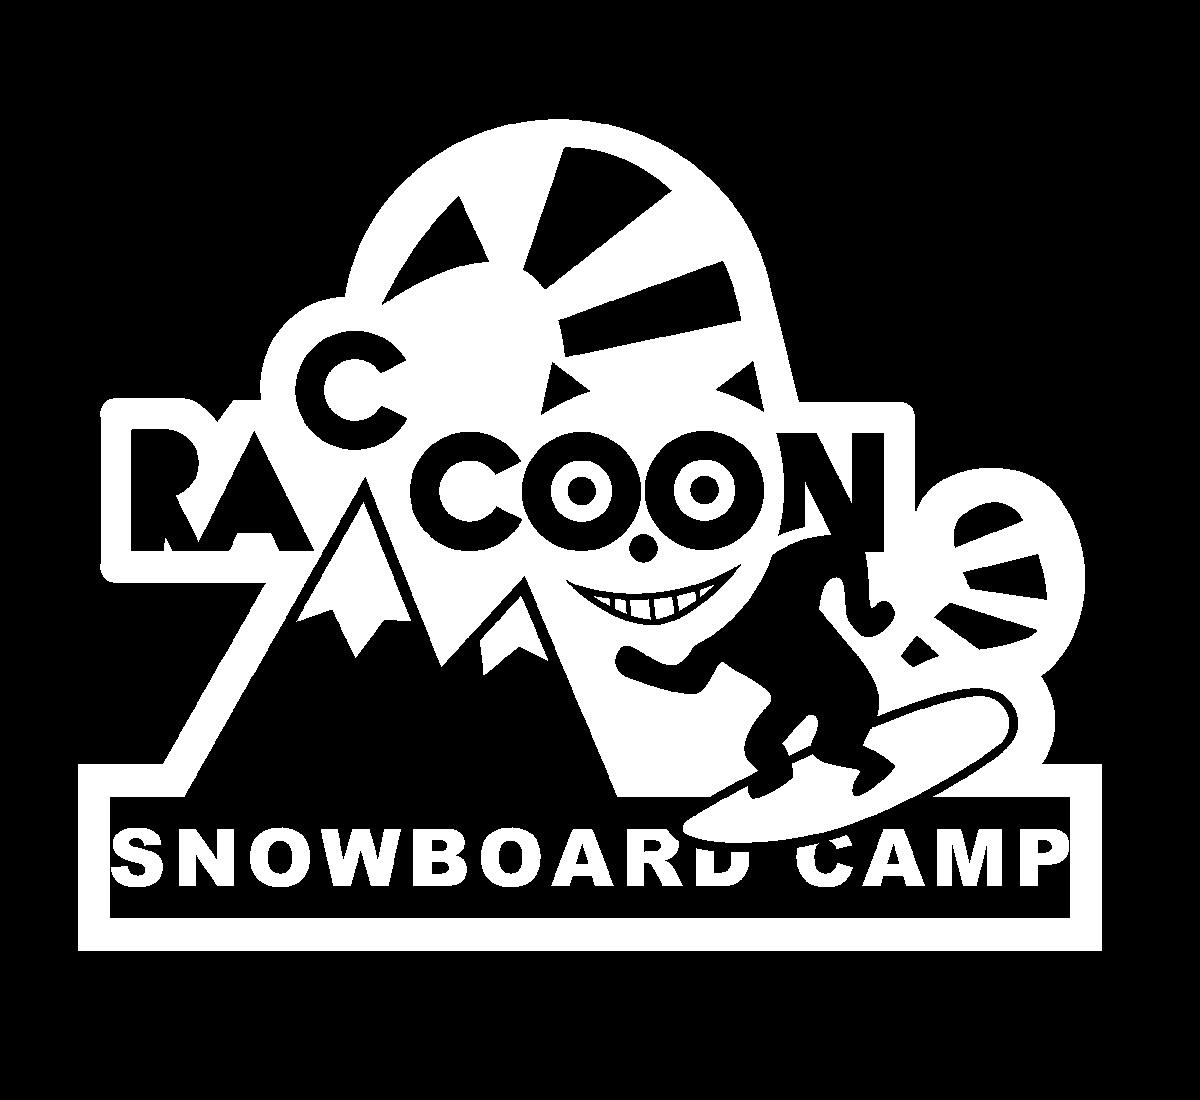 Riding Raccoons